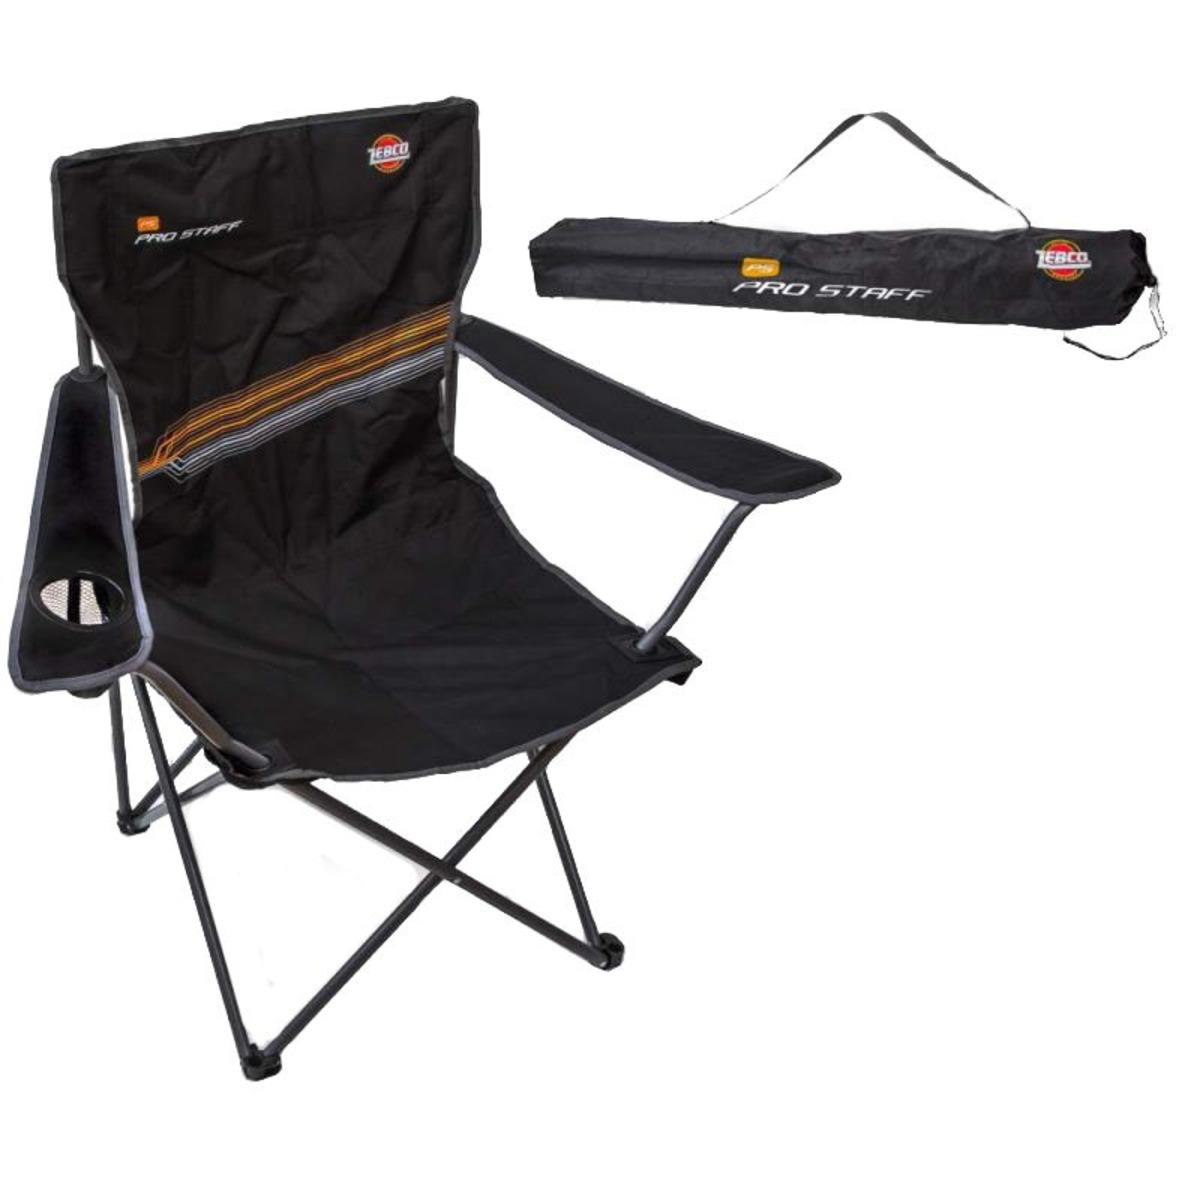 Zebco Pro Staff Chair BS - 42x58x55 cm